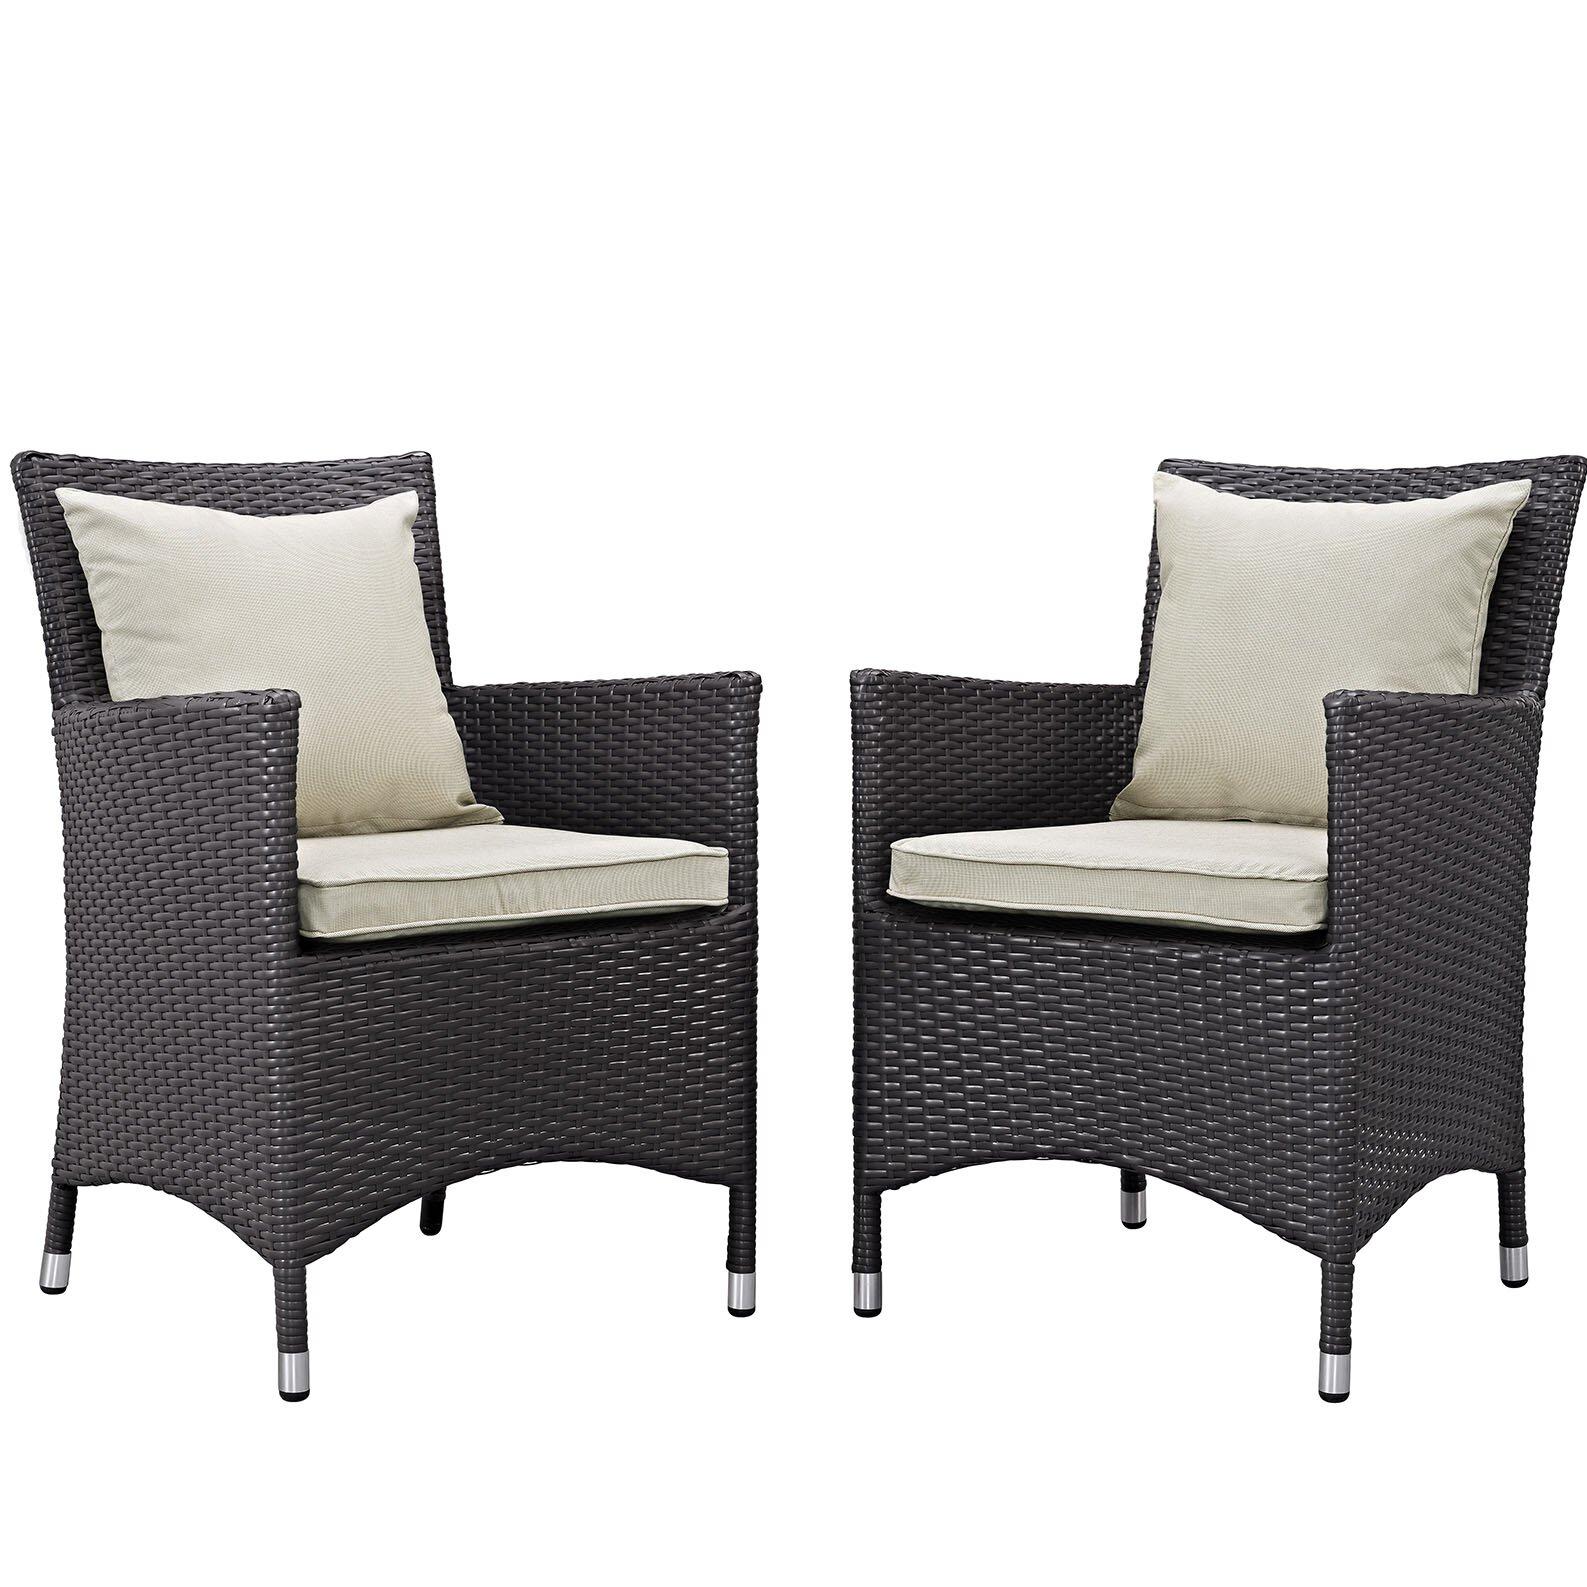 Convene Patio Chair with Cushions